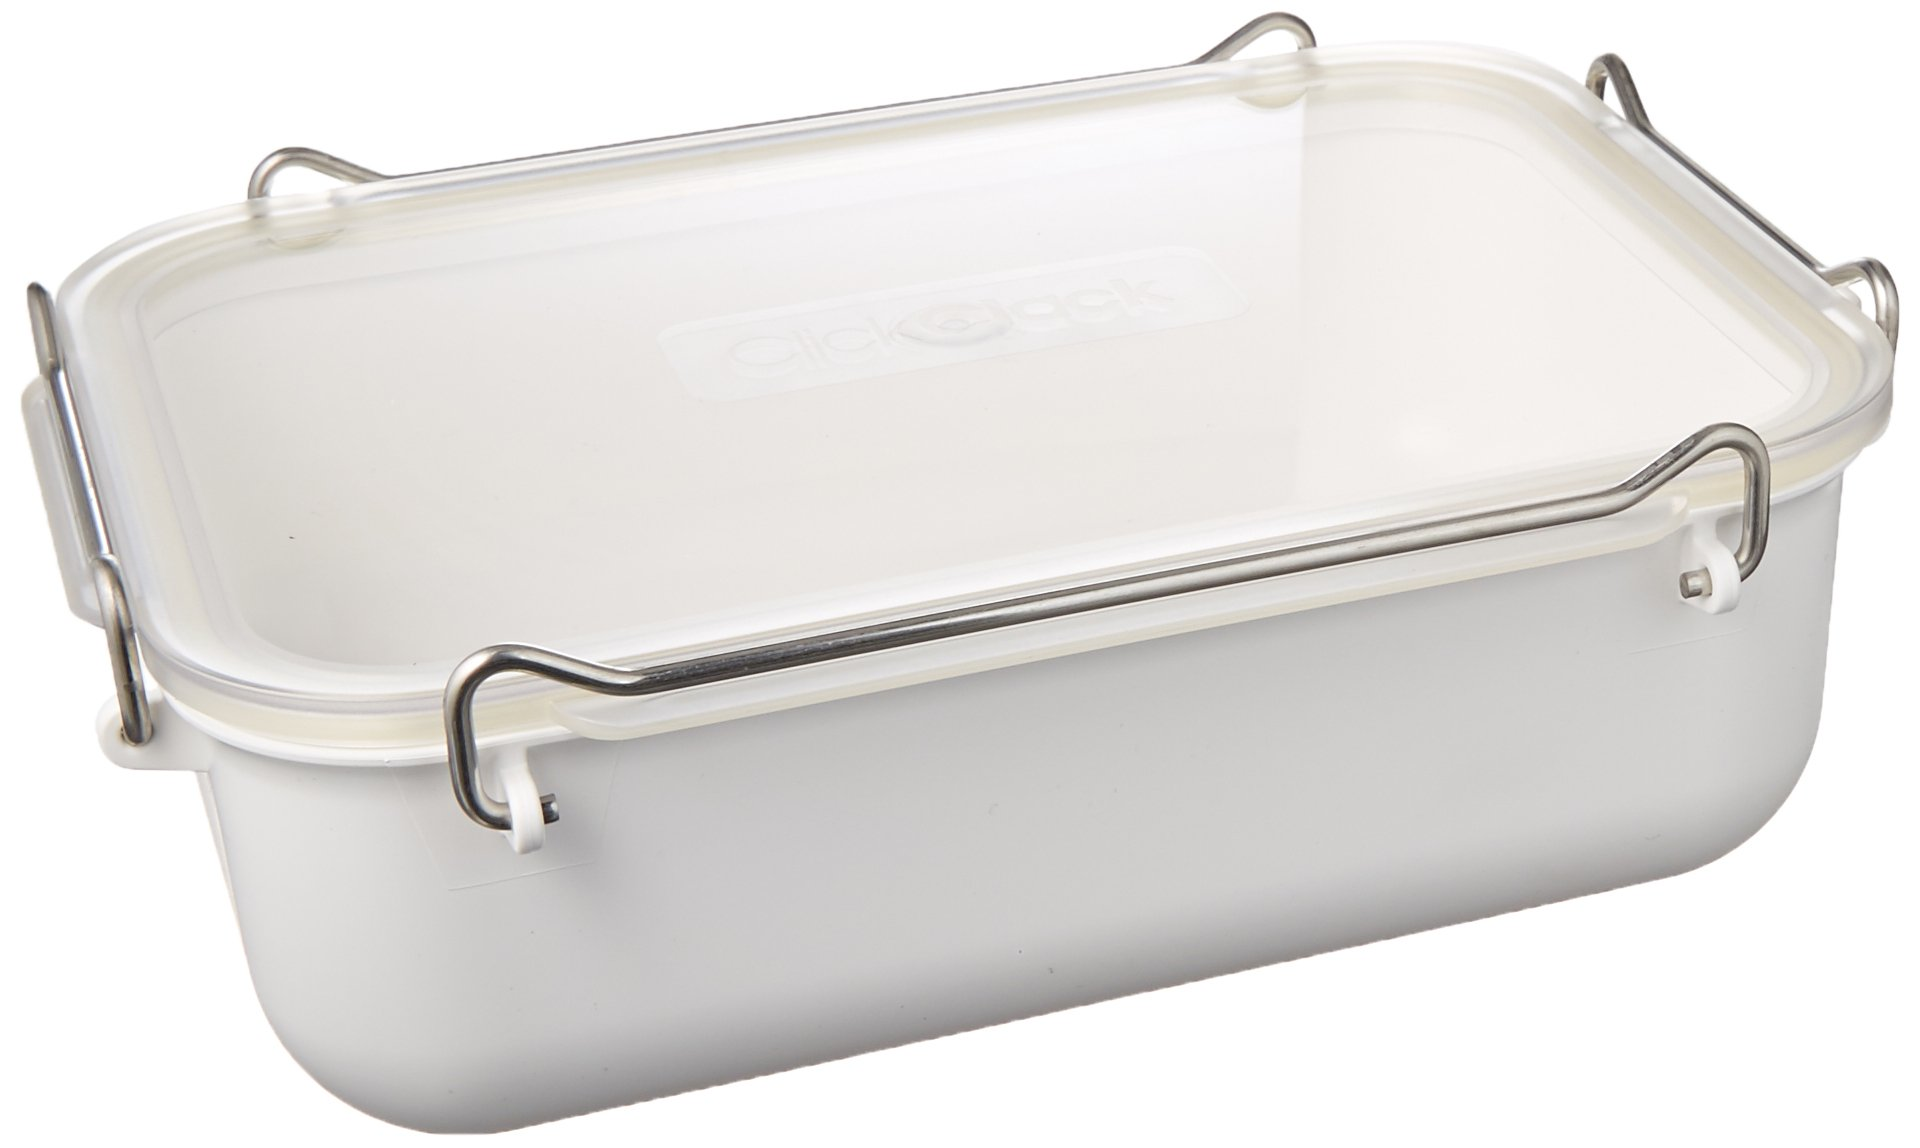 ClickClack Everyday Storage Container, 1.4-Quart, White